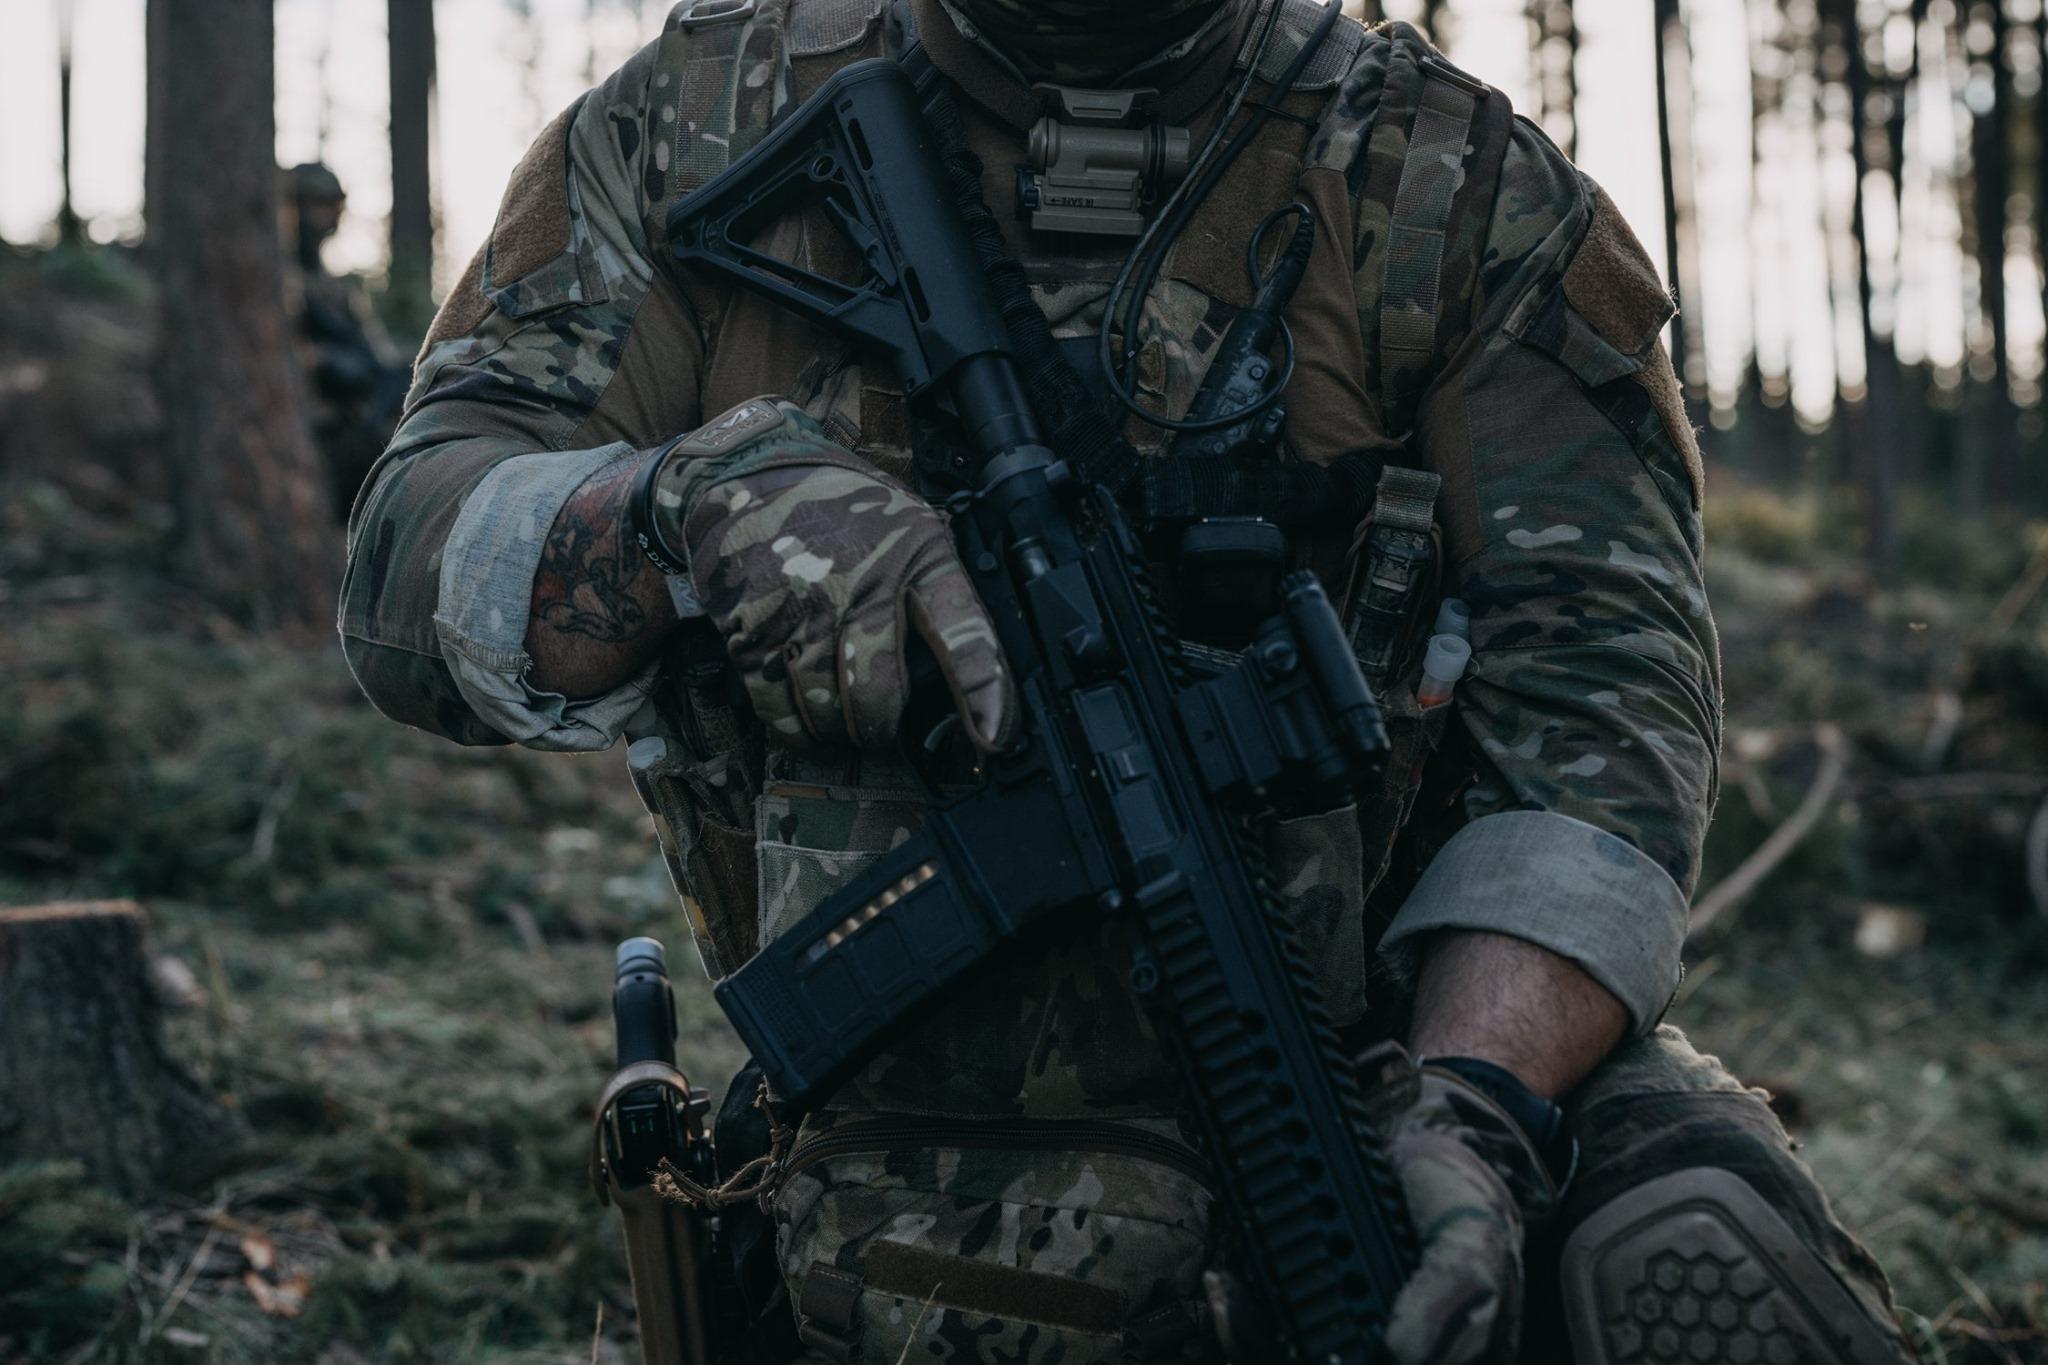 ANTREG-ARS-M4s-4Q-czech-military